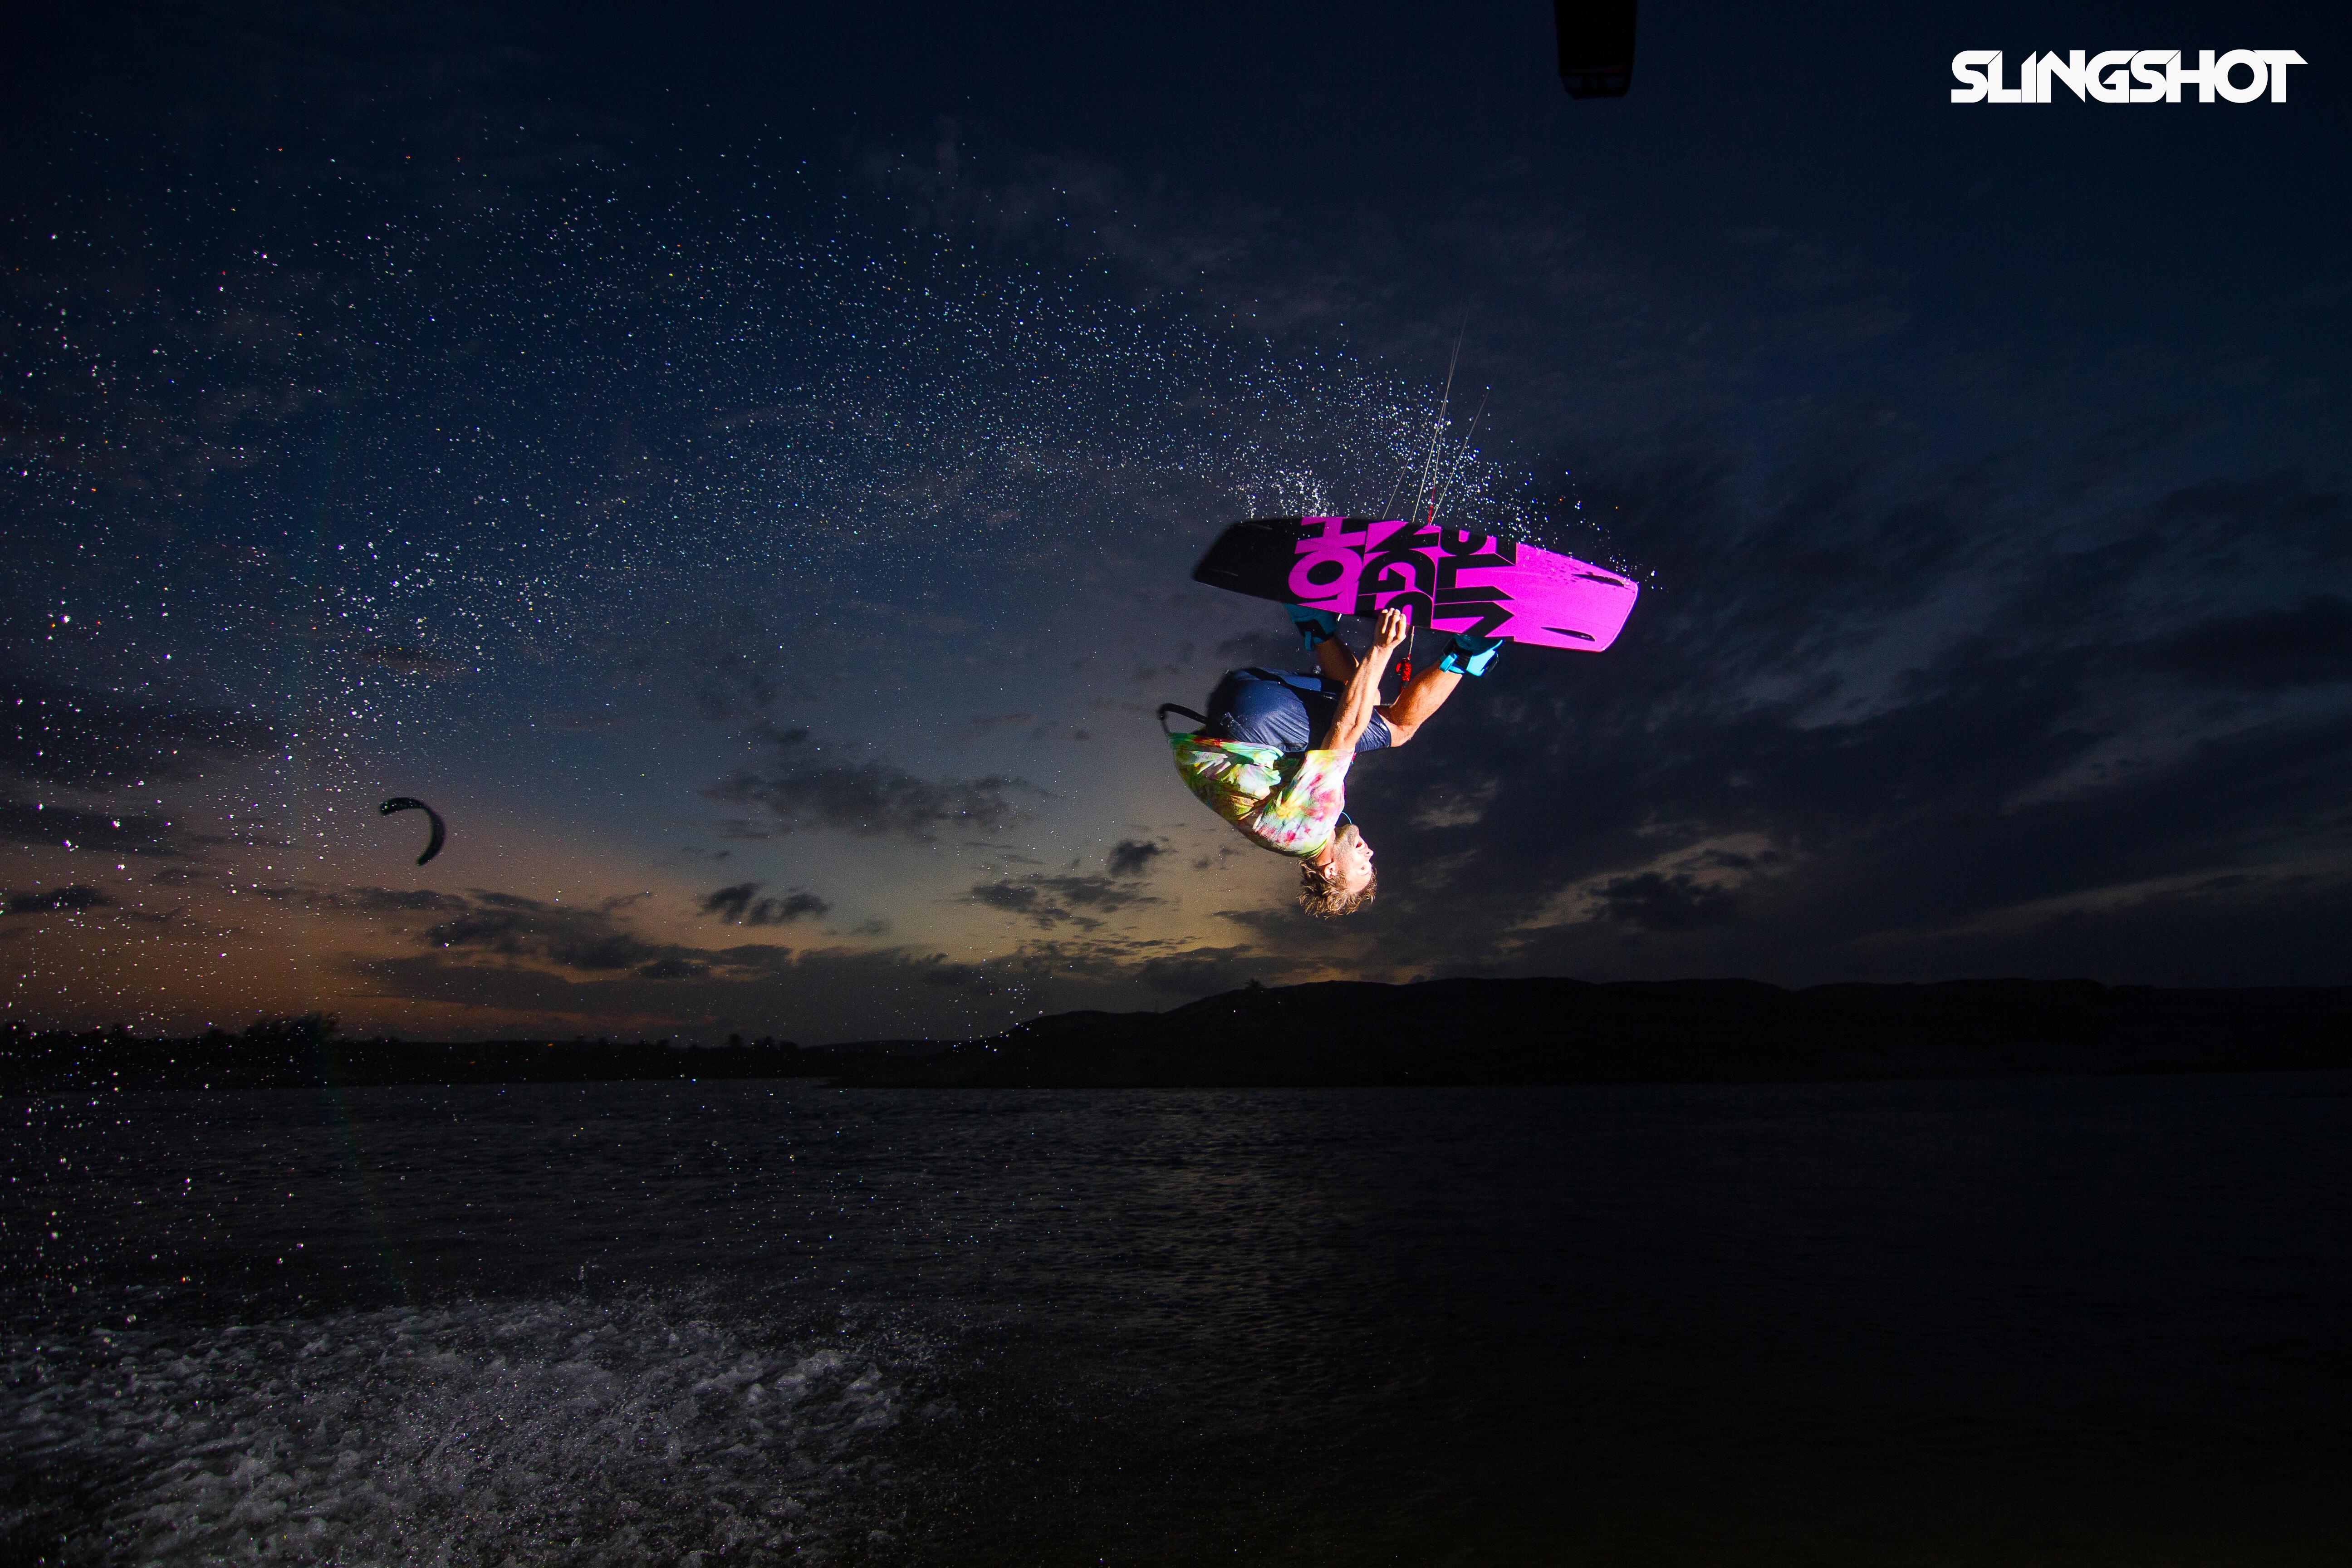 kitesurf wallpaper image - Sam Light on the 2015 Slingshot asylum board. Inverted with a grab kitesurfing. - in resolution: Original 5184 X 3456